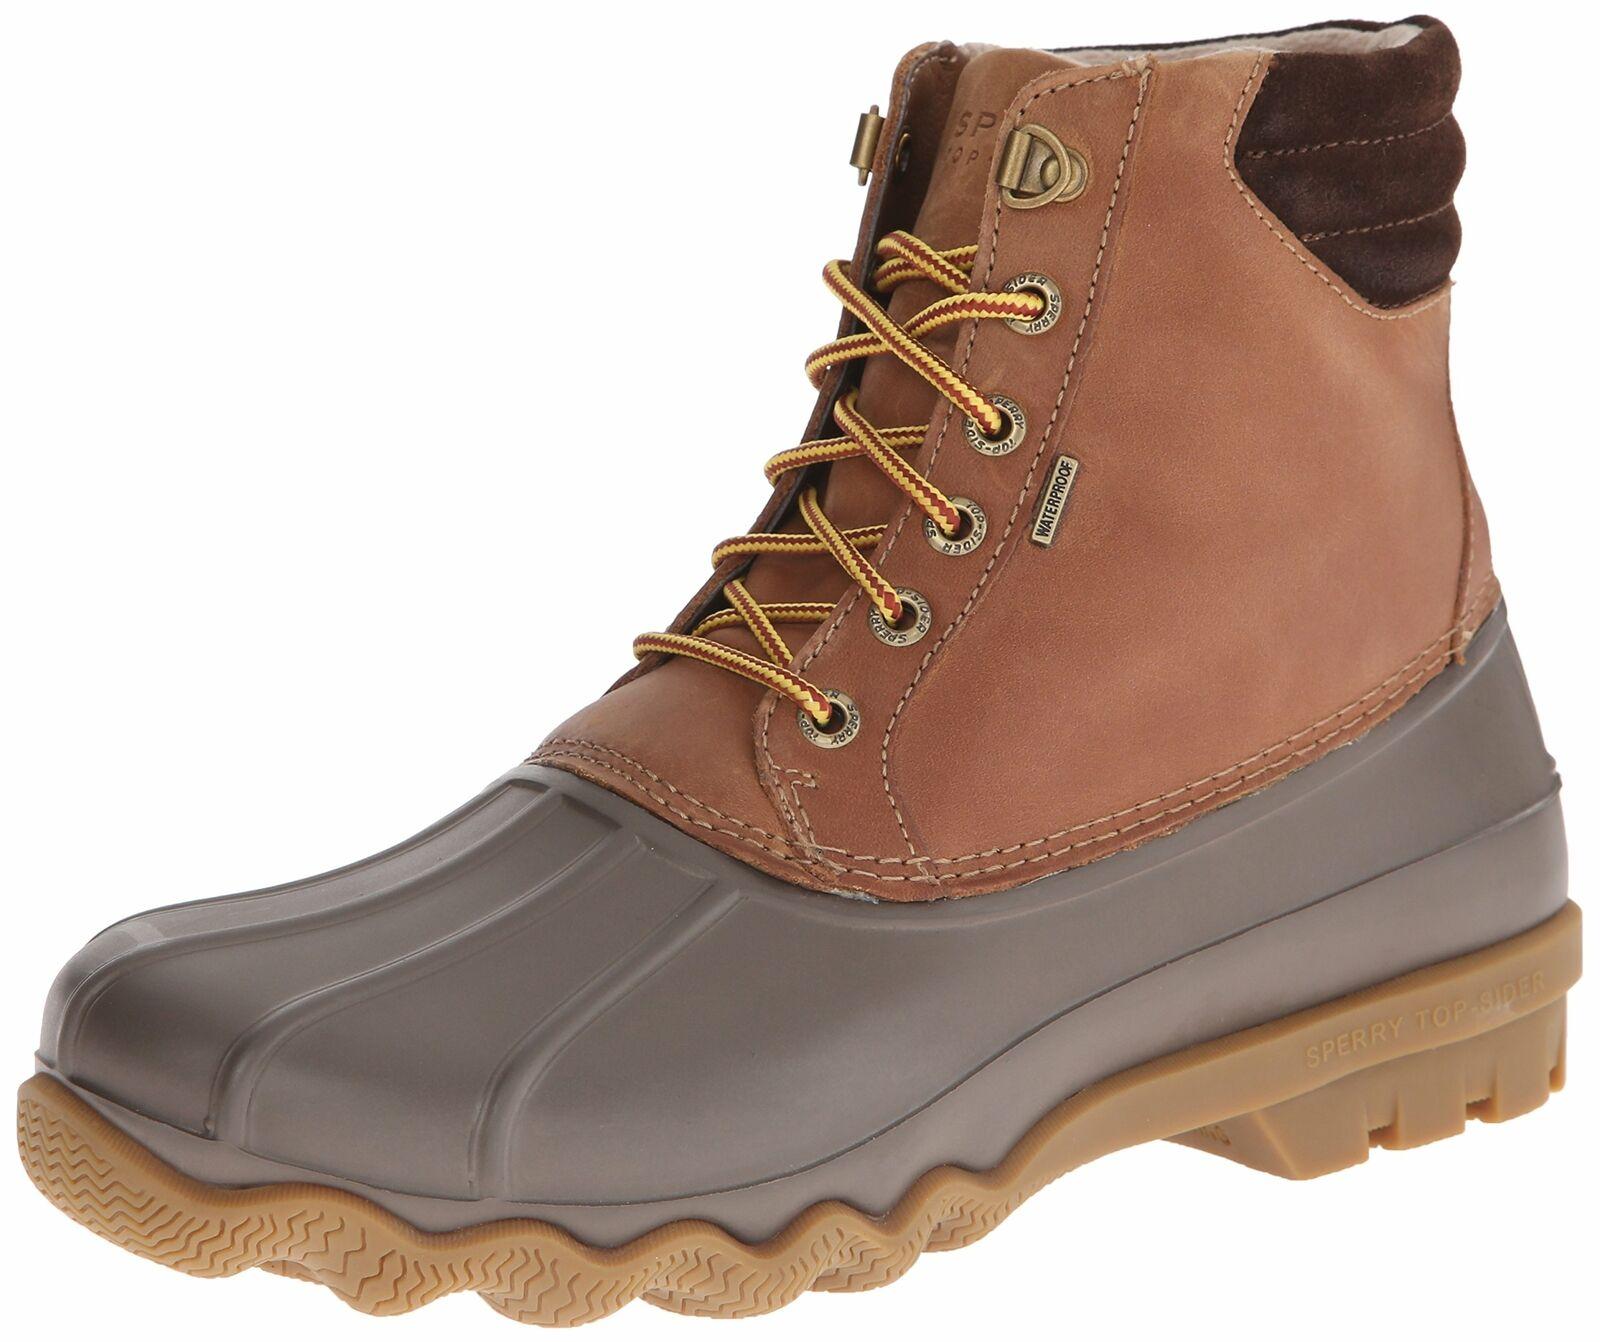 Sperry Men's Avenue Duck Rain Boot Tan Brown